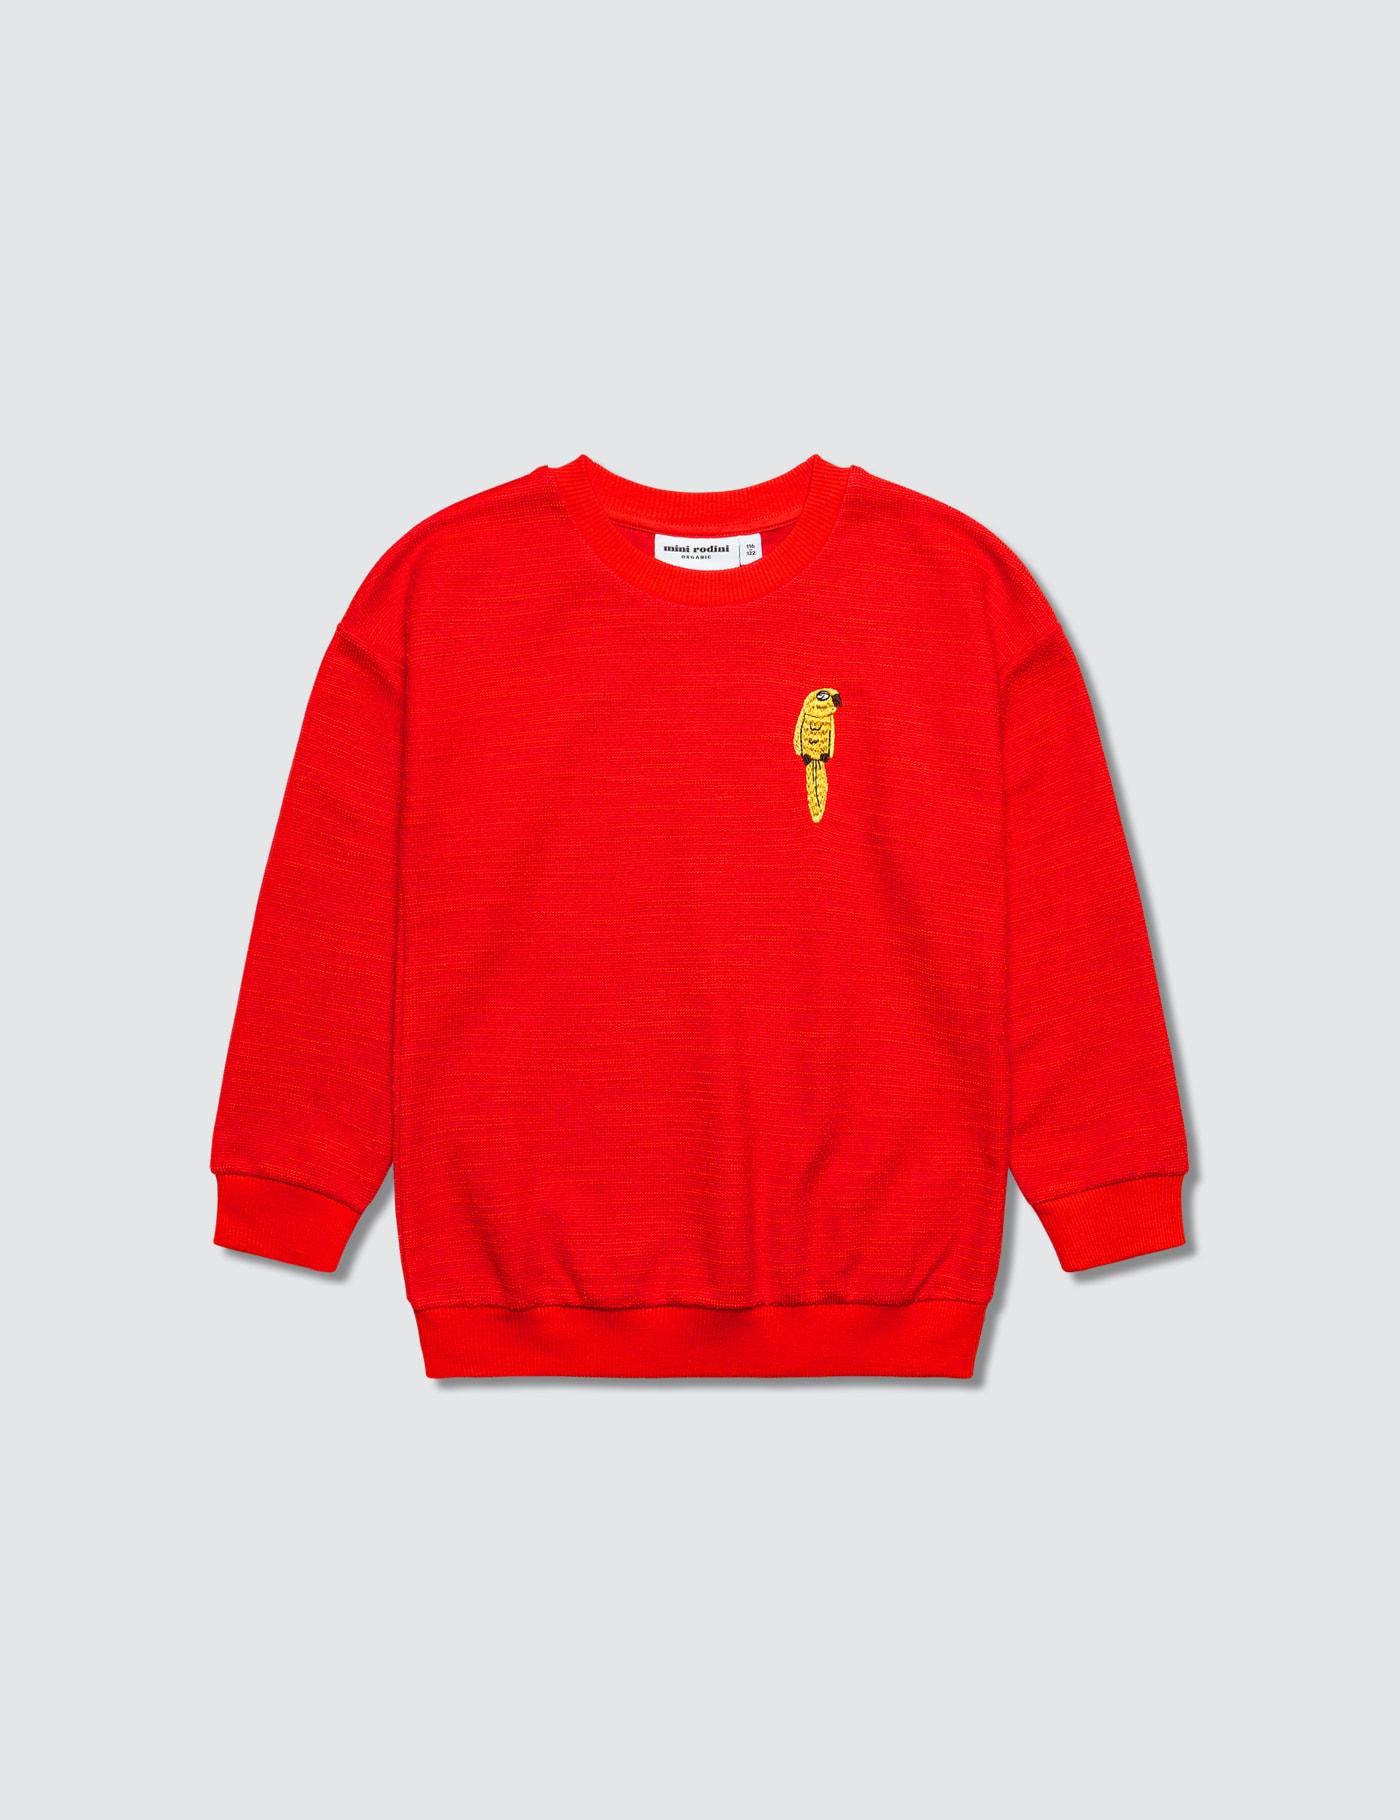 Parrot Embroidery Sweatshirt